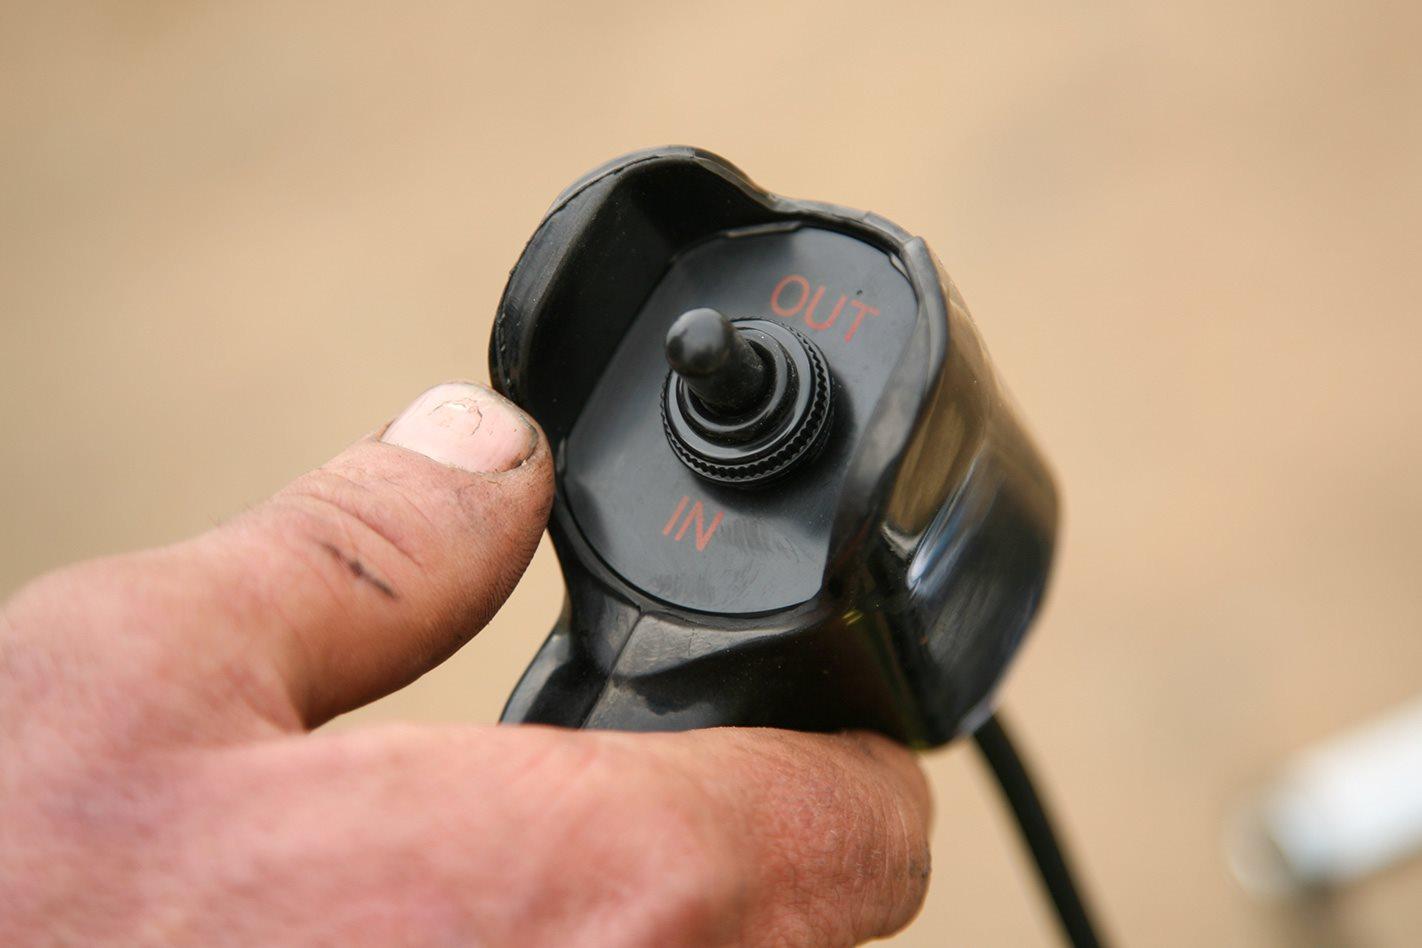 Thunder 9500 winch wireless remote